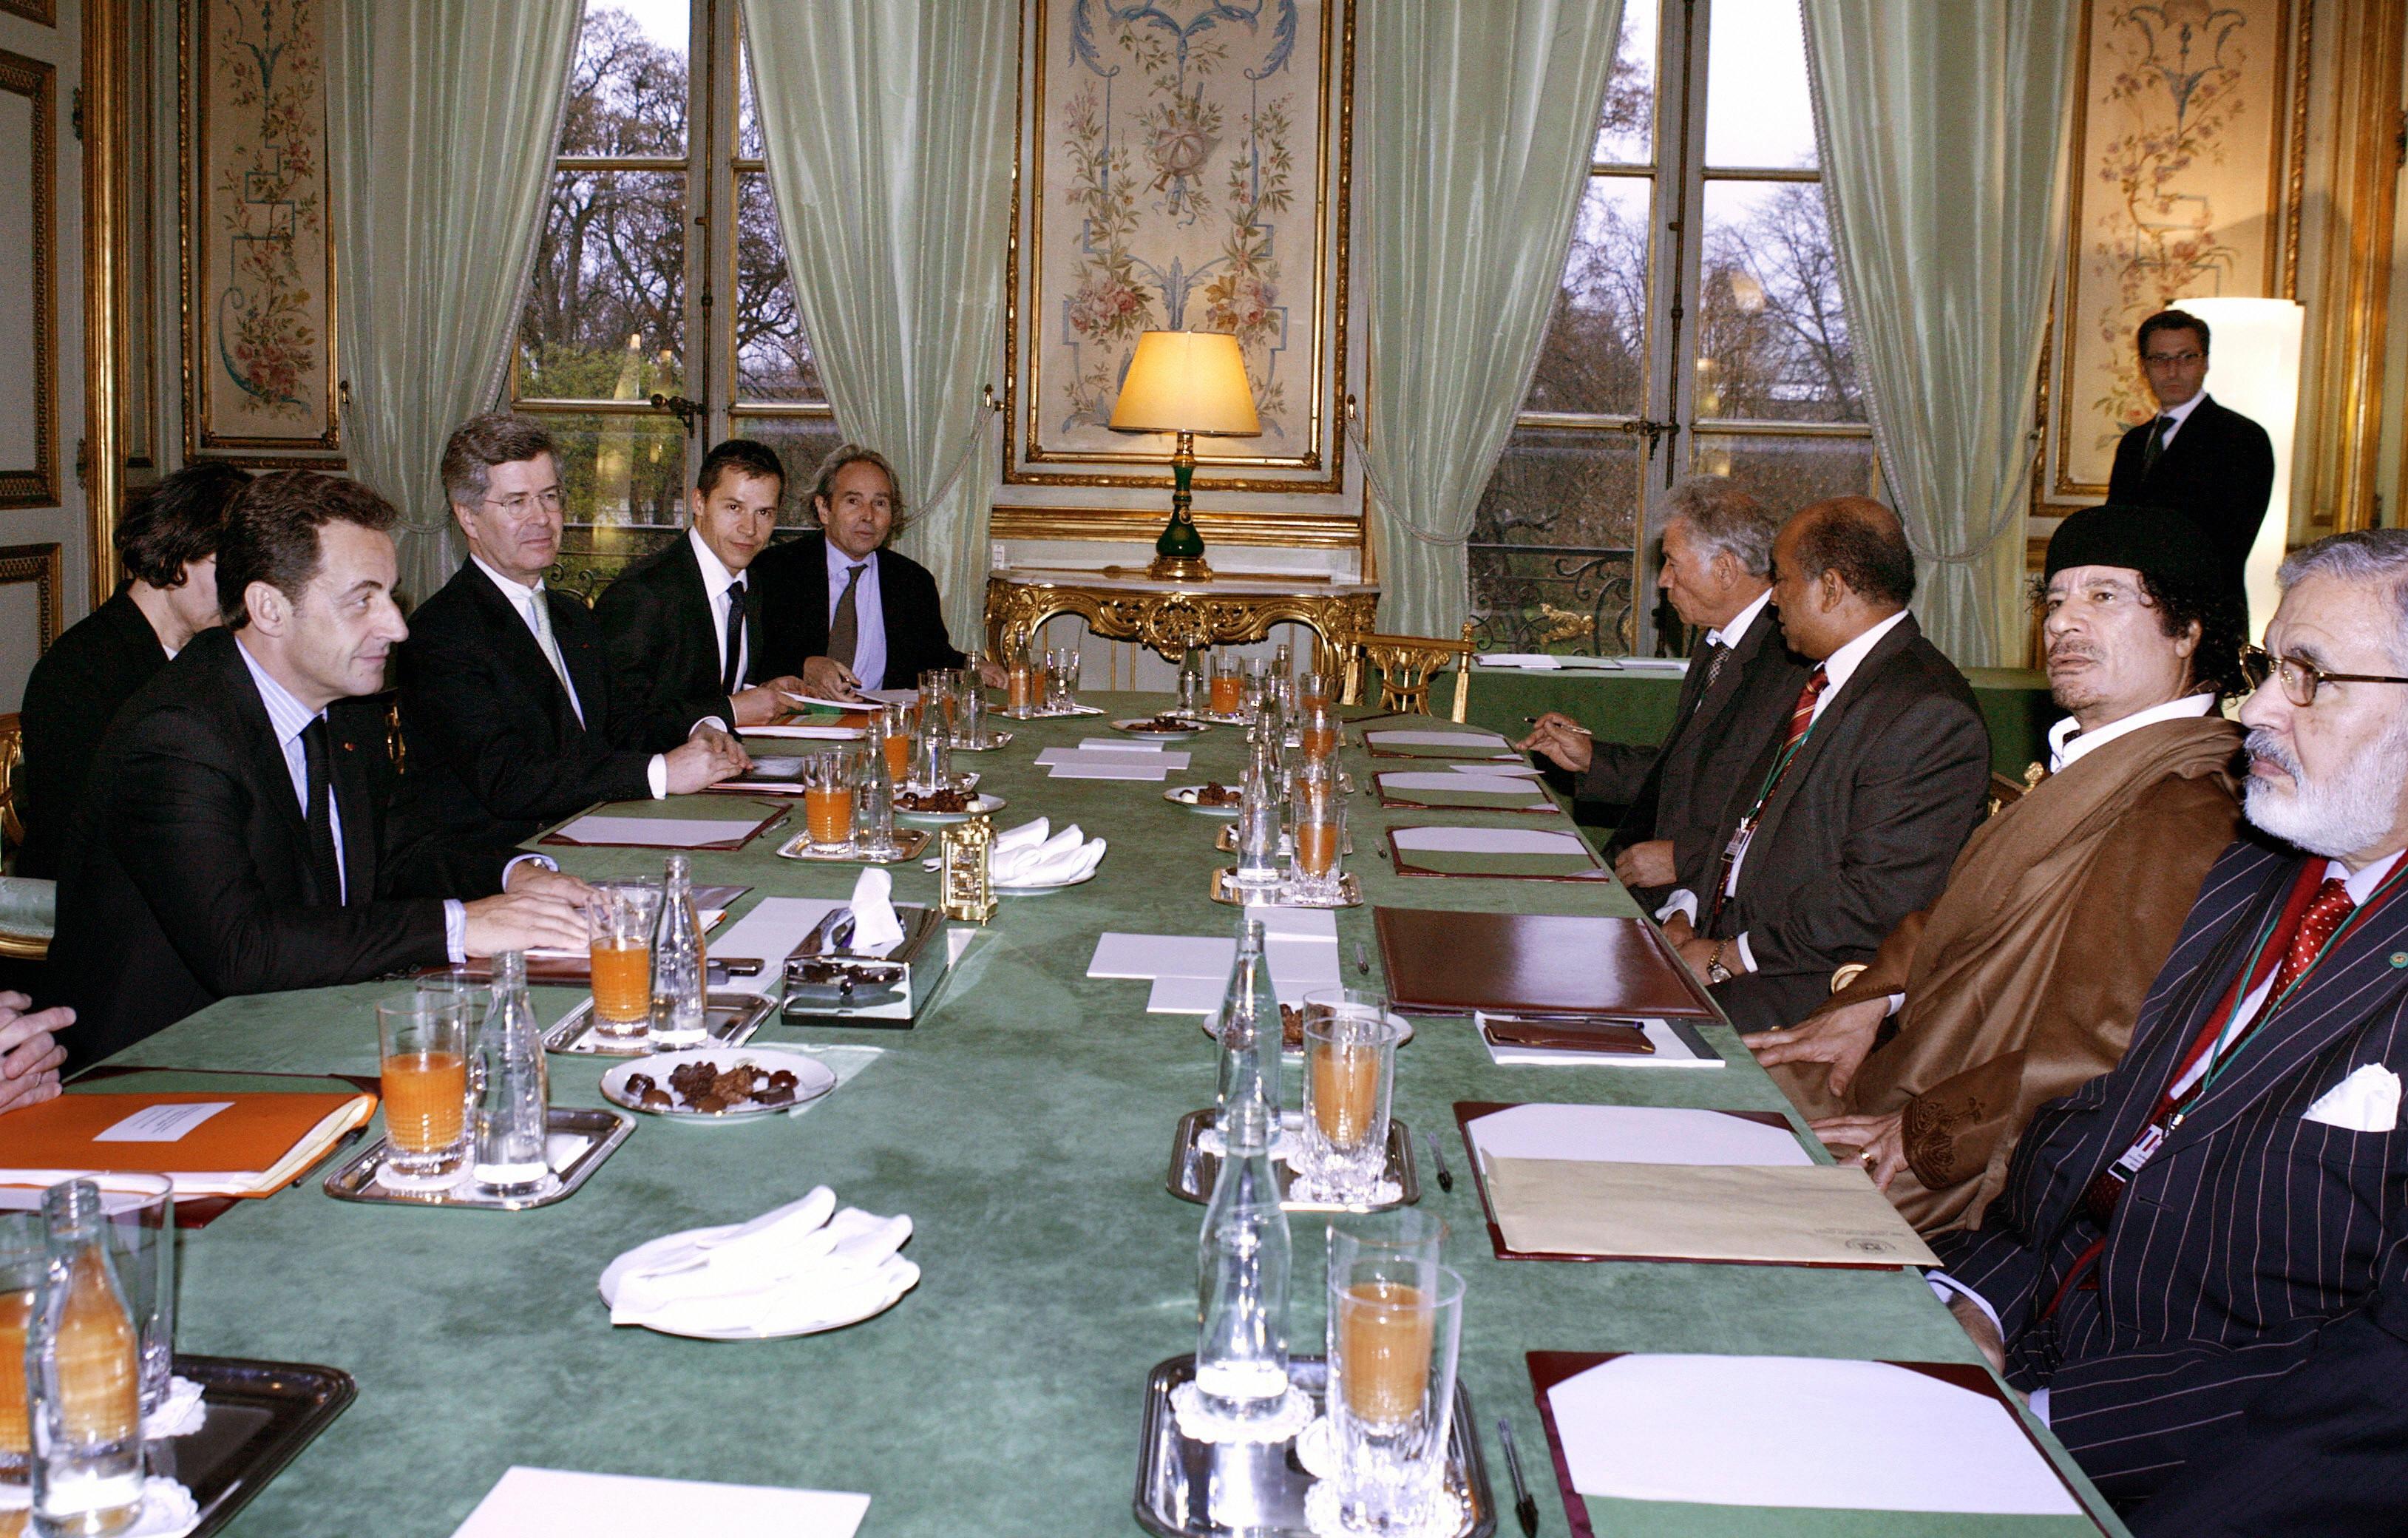 Frenc president Nicolas Sarkozy (L) pose